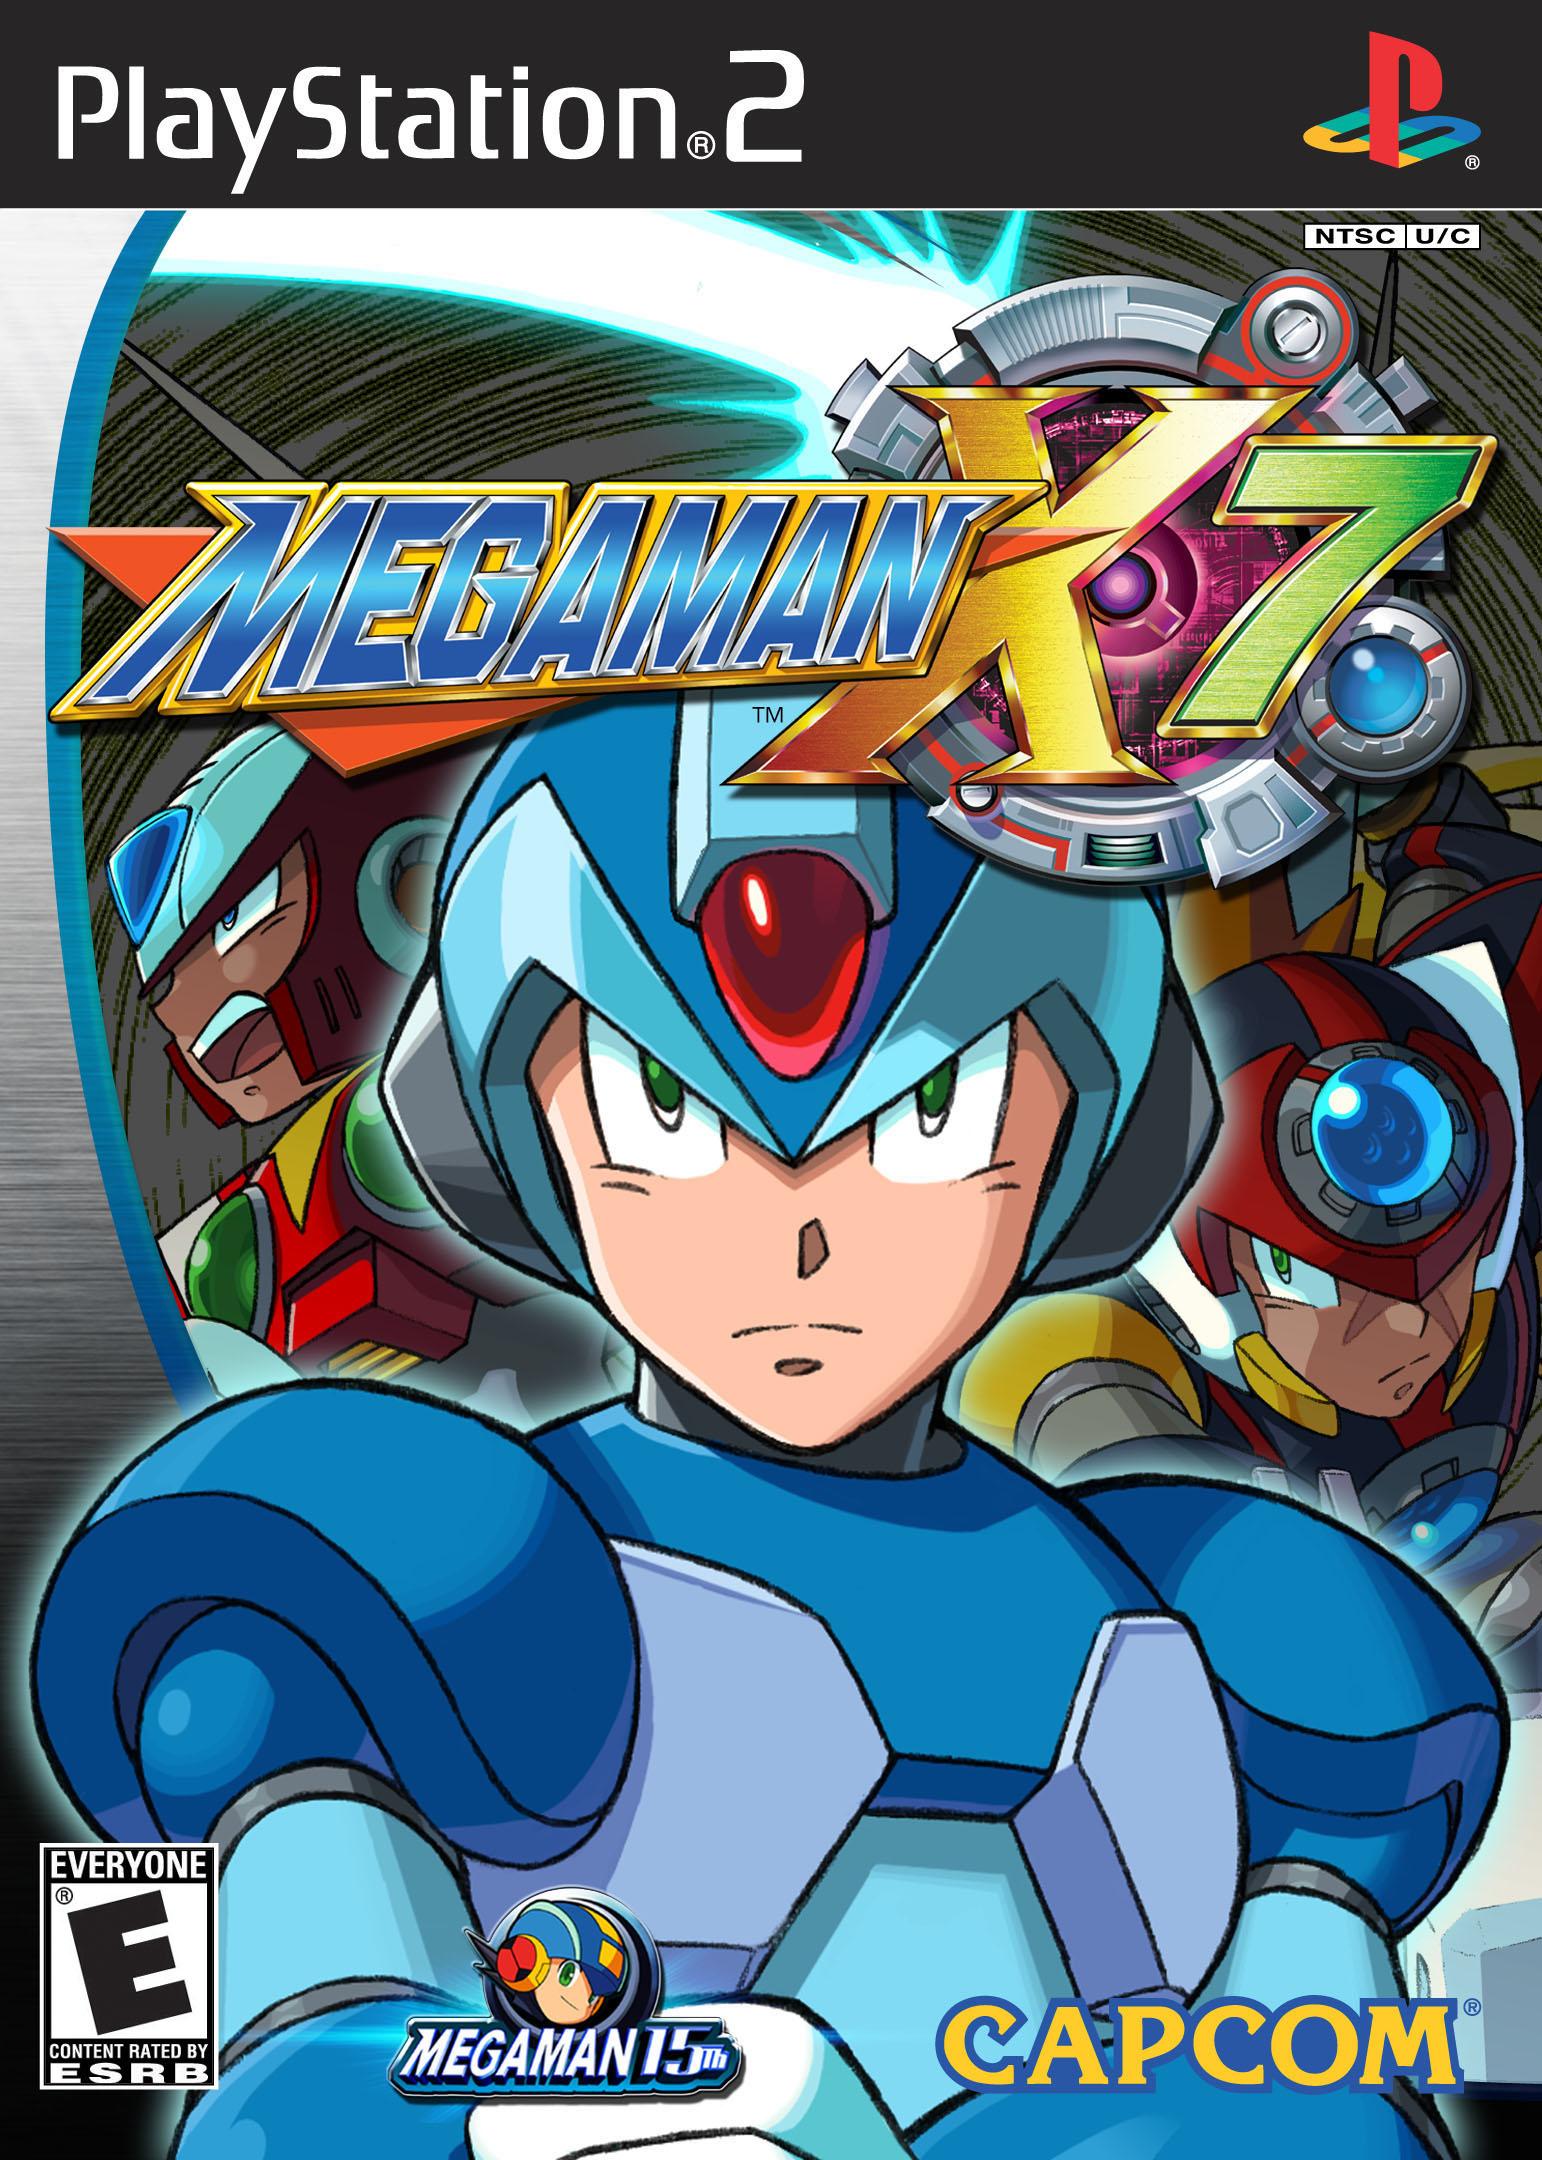 Megaman x6 pc download rar | Download Game Megaman X6 tuyệt đỉnh cho